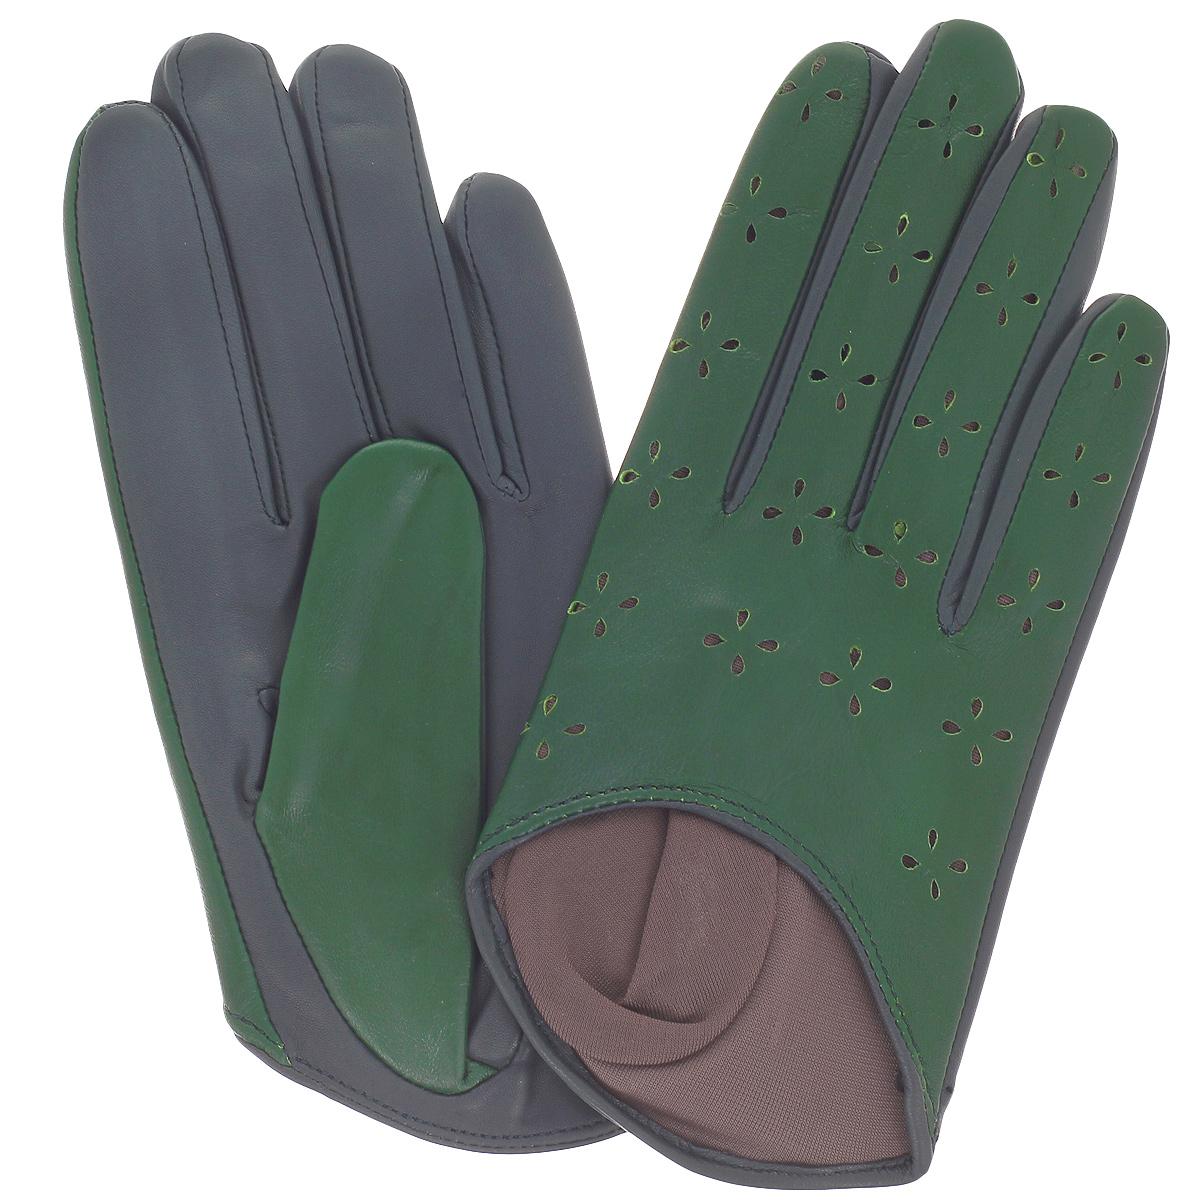 перчатки женские michel katana цвет фуксия k81 if1 размер 6 5 Перчатки женские Michel Katana, цвет: изумруд. K81- H1. Размер 6,5